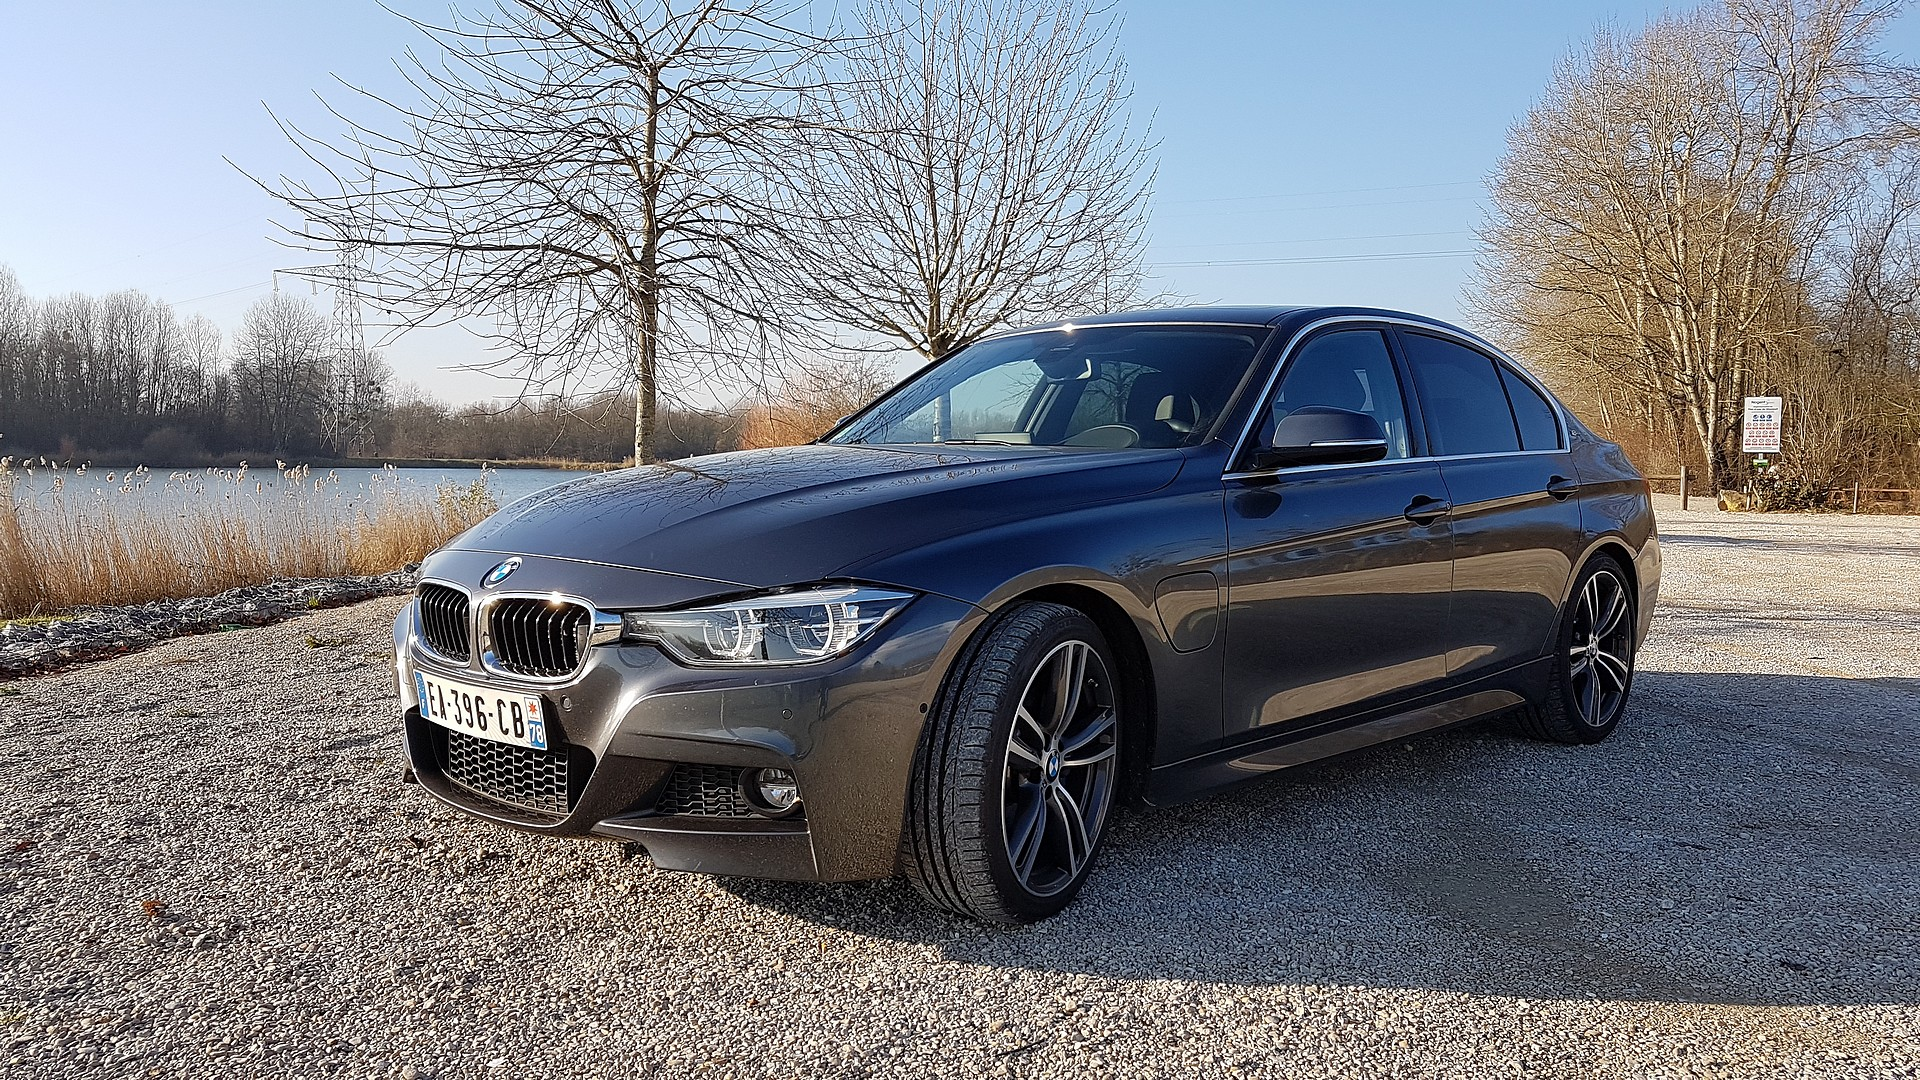 Essai BMW 330e : la discrète qui cache bien son jeu